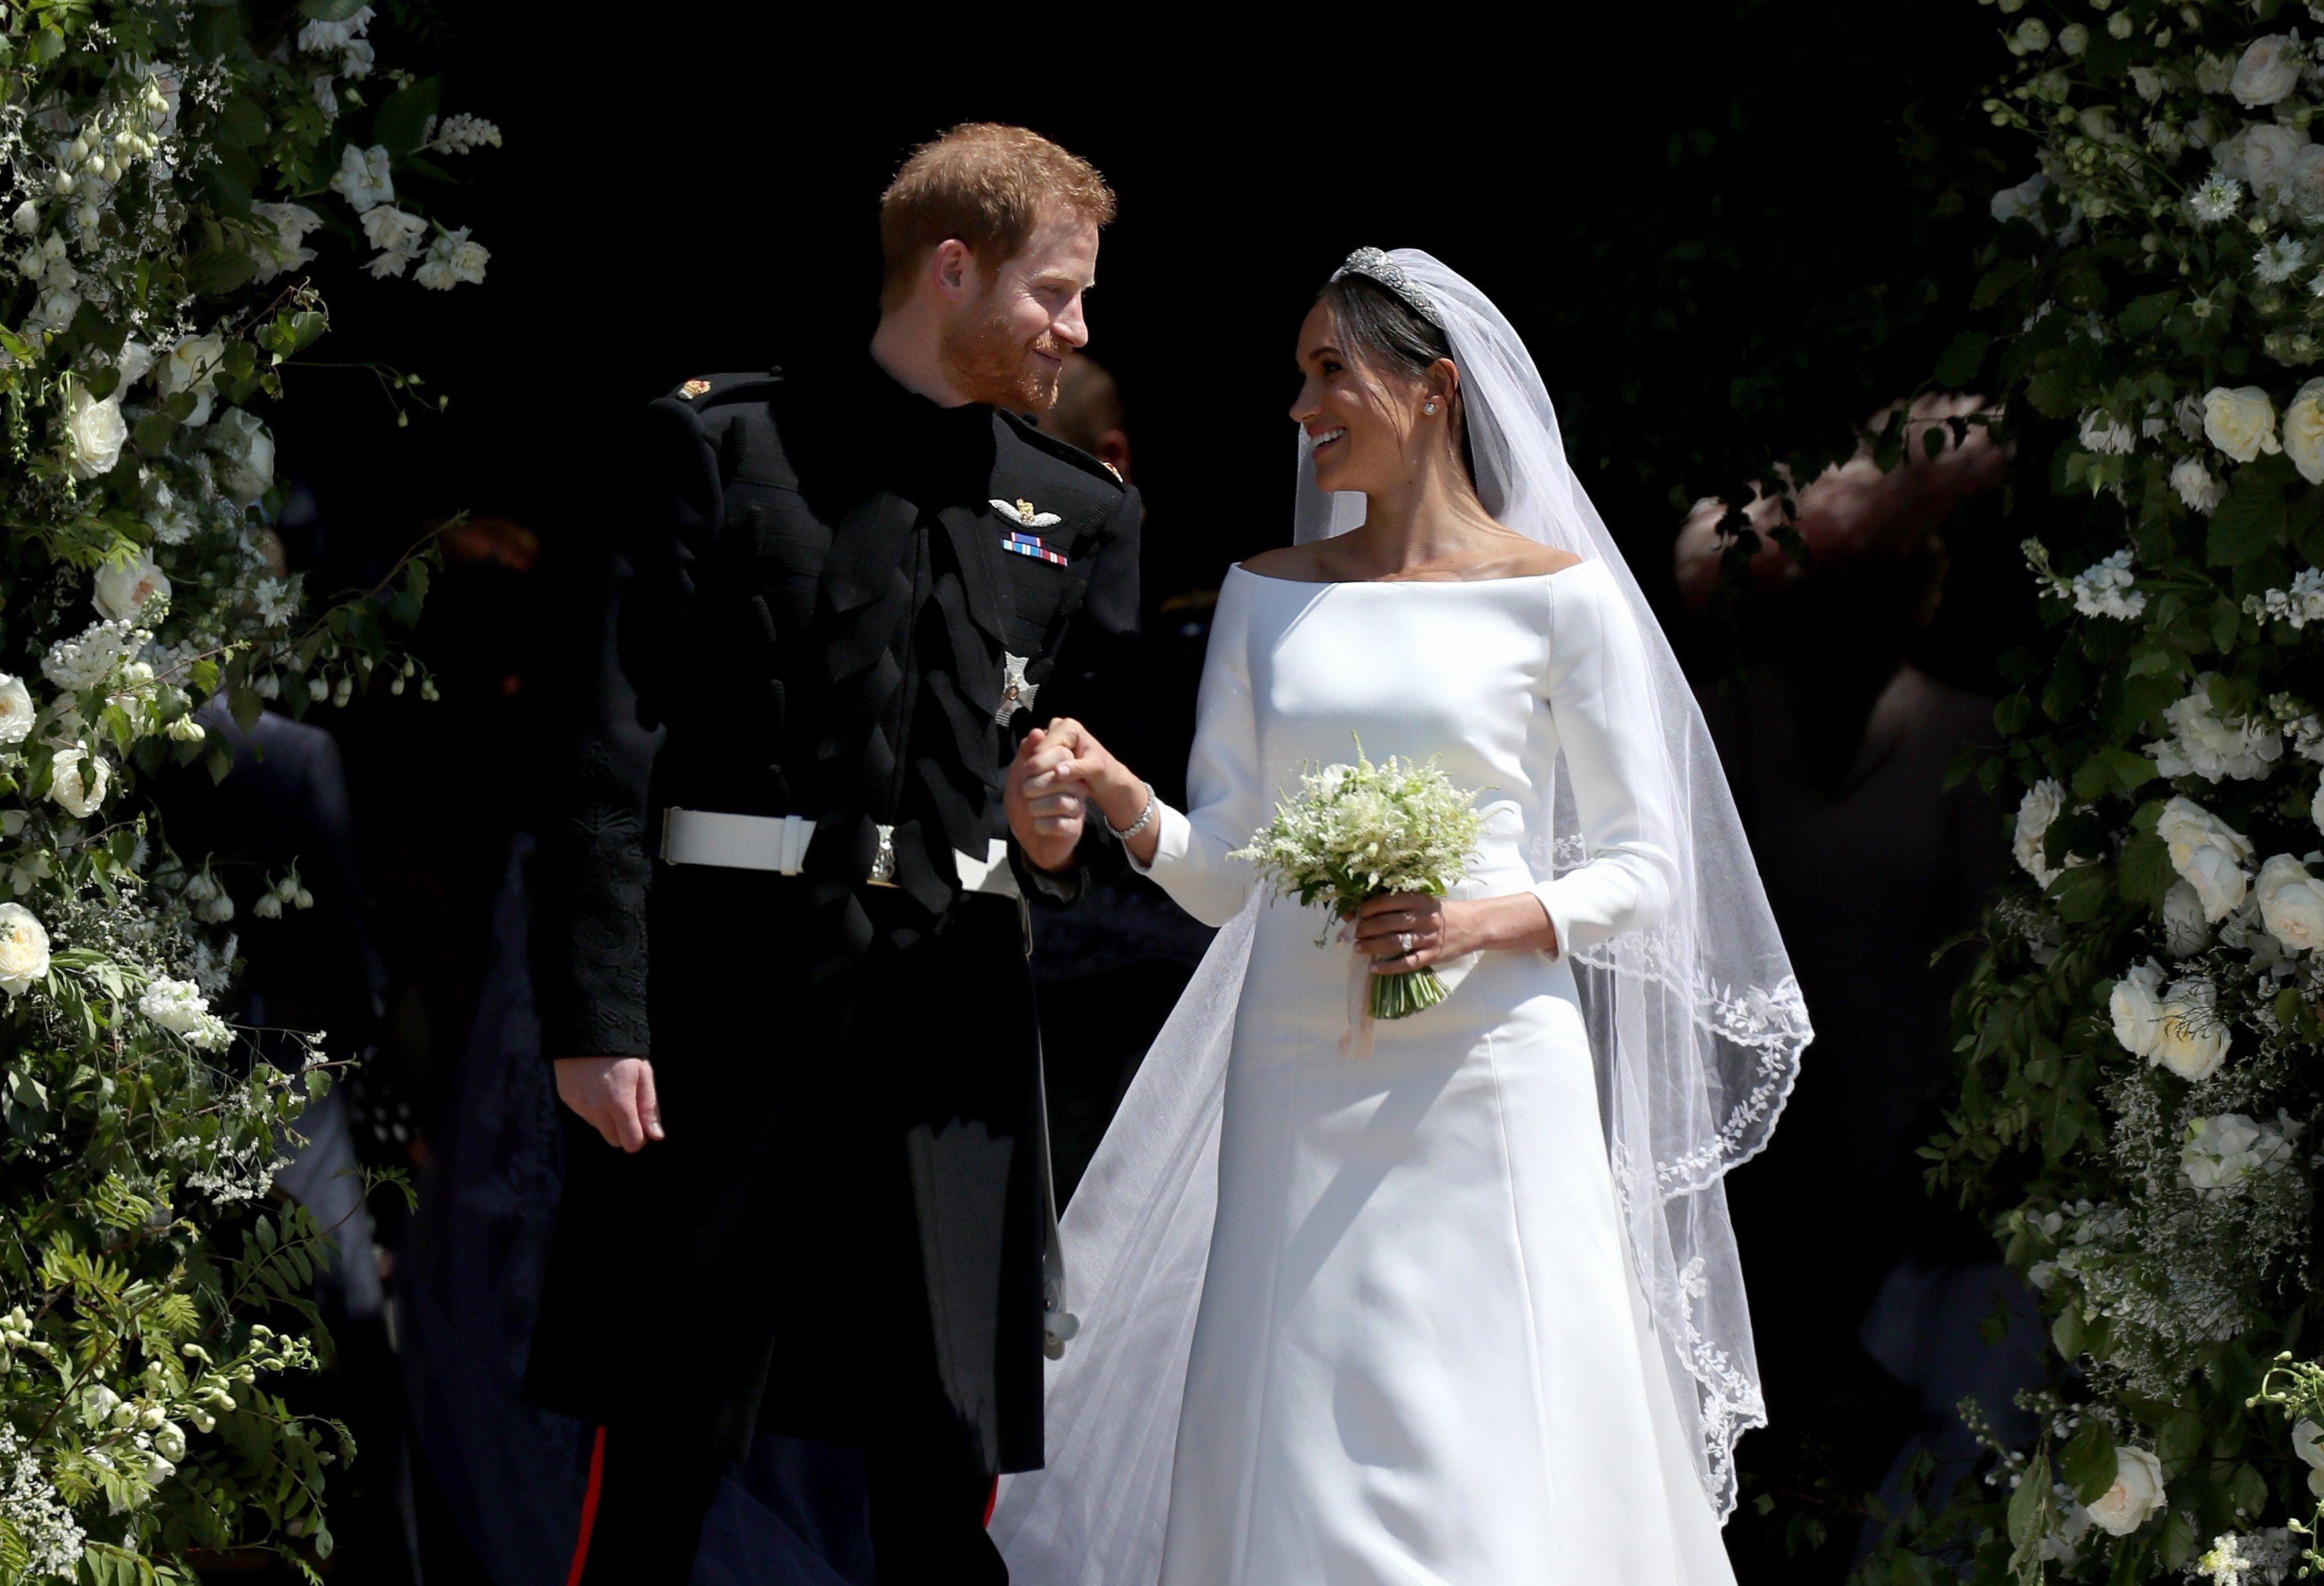 Wedding Dress Cleaning Long island in 2020 Meghan markle